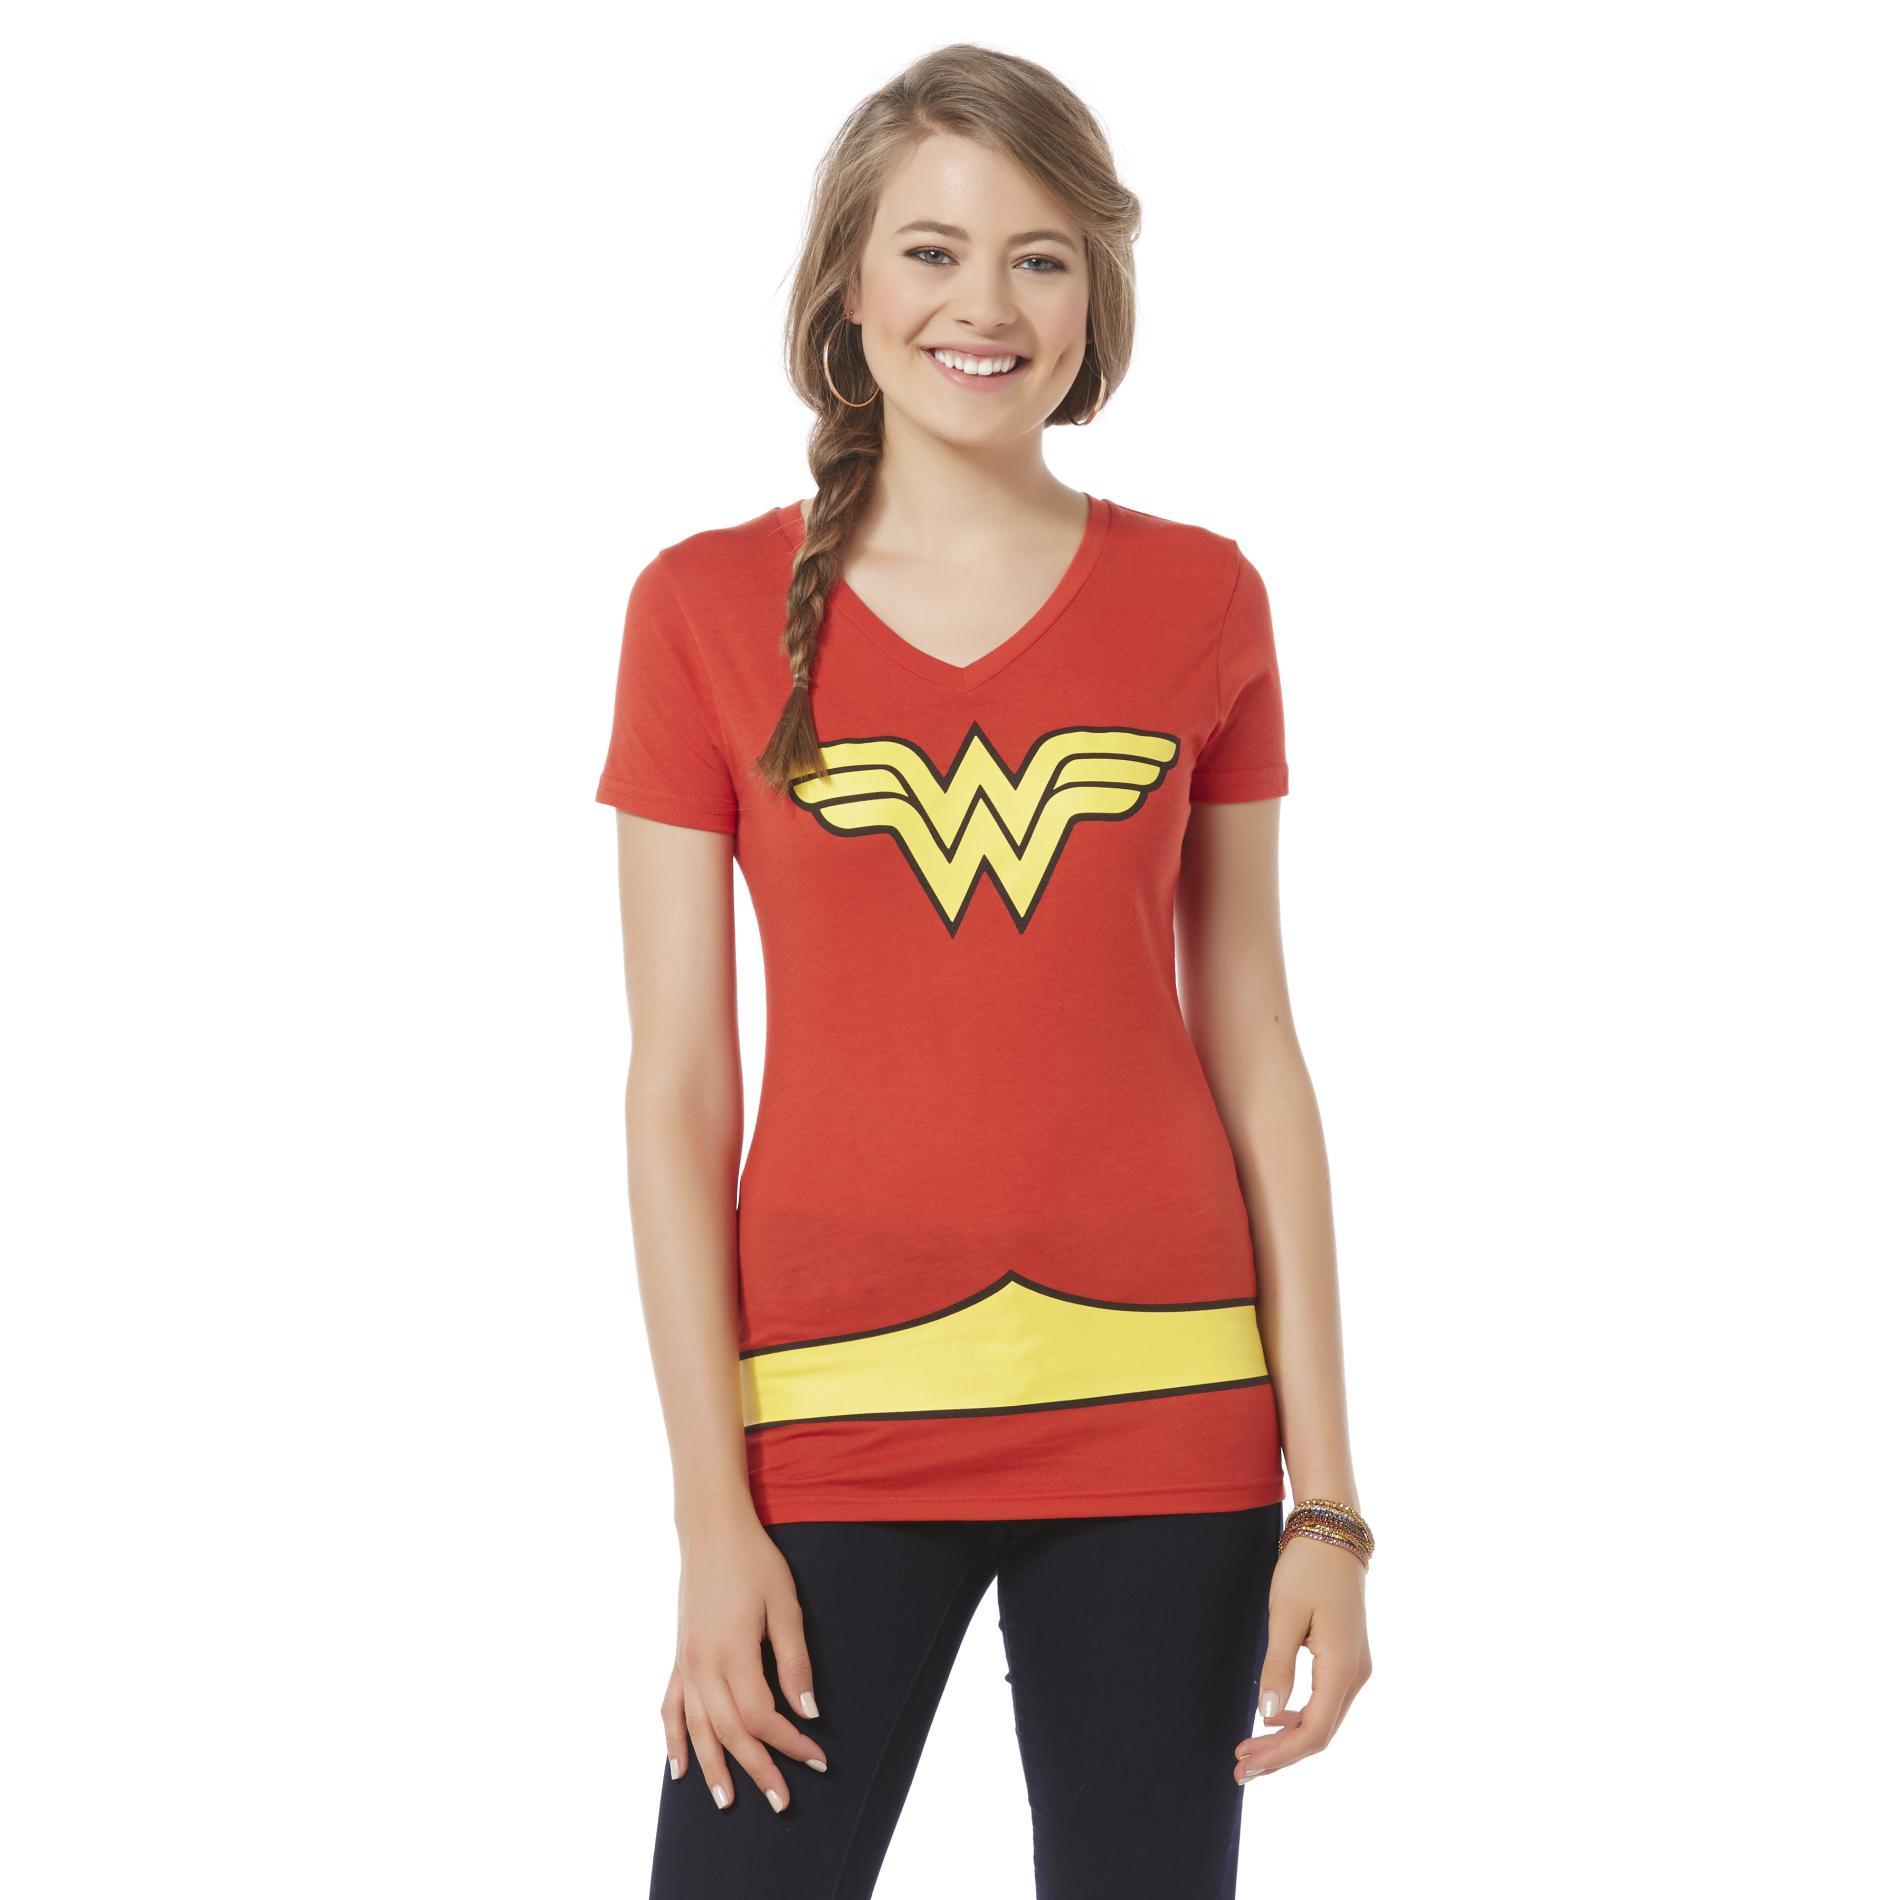 DC Comics Wonder Woman Women's Costume T-Shirt PartNumber: 027VA84854412P MfgPartNumber: VN3C5HDCO